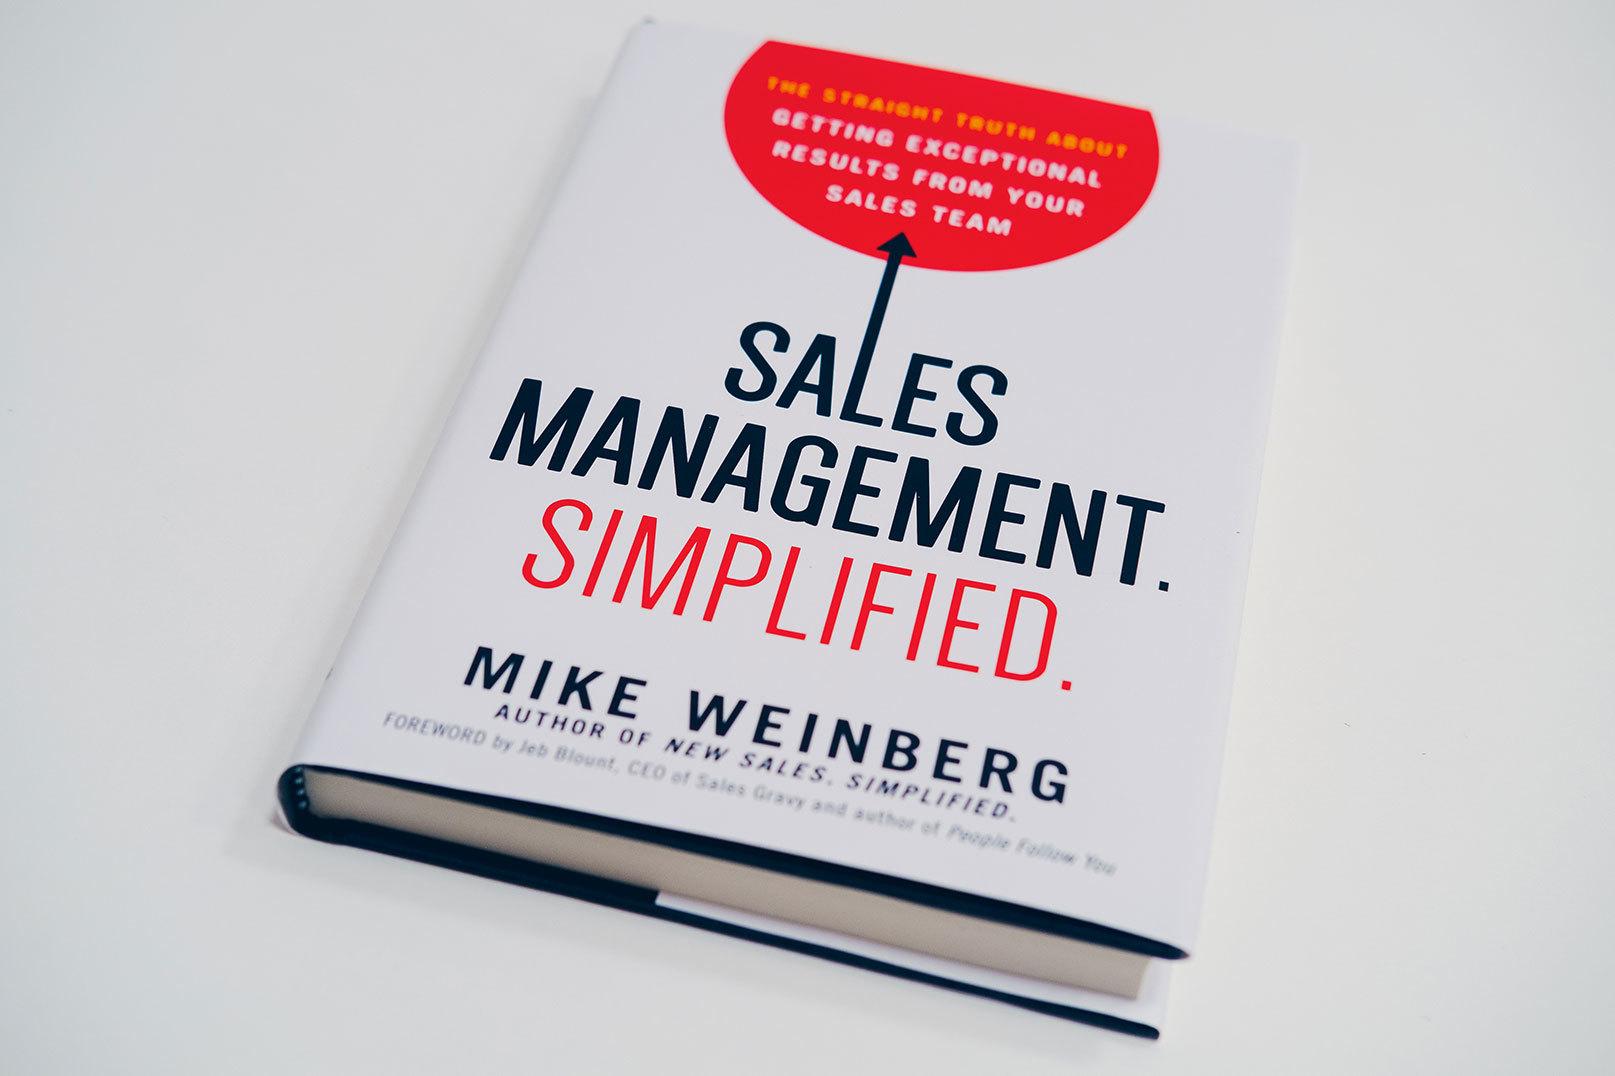 Best sales management book reports best sales management book reports